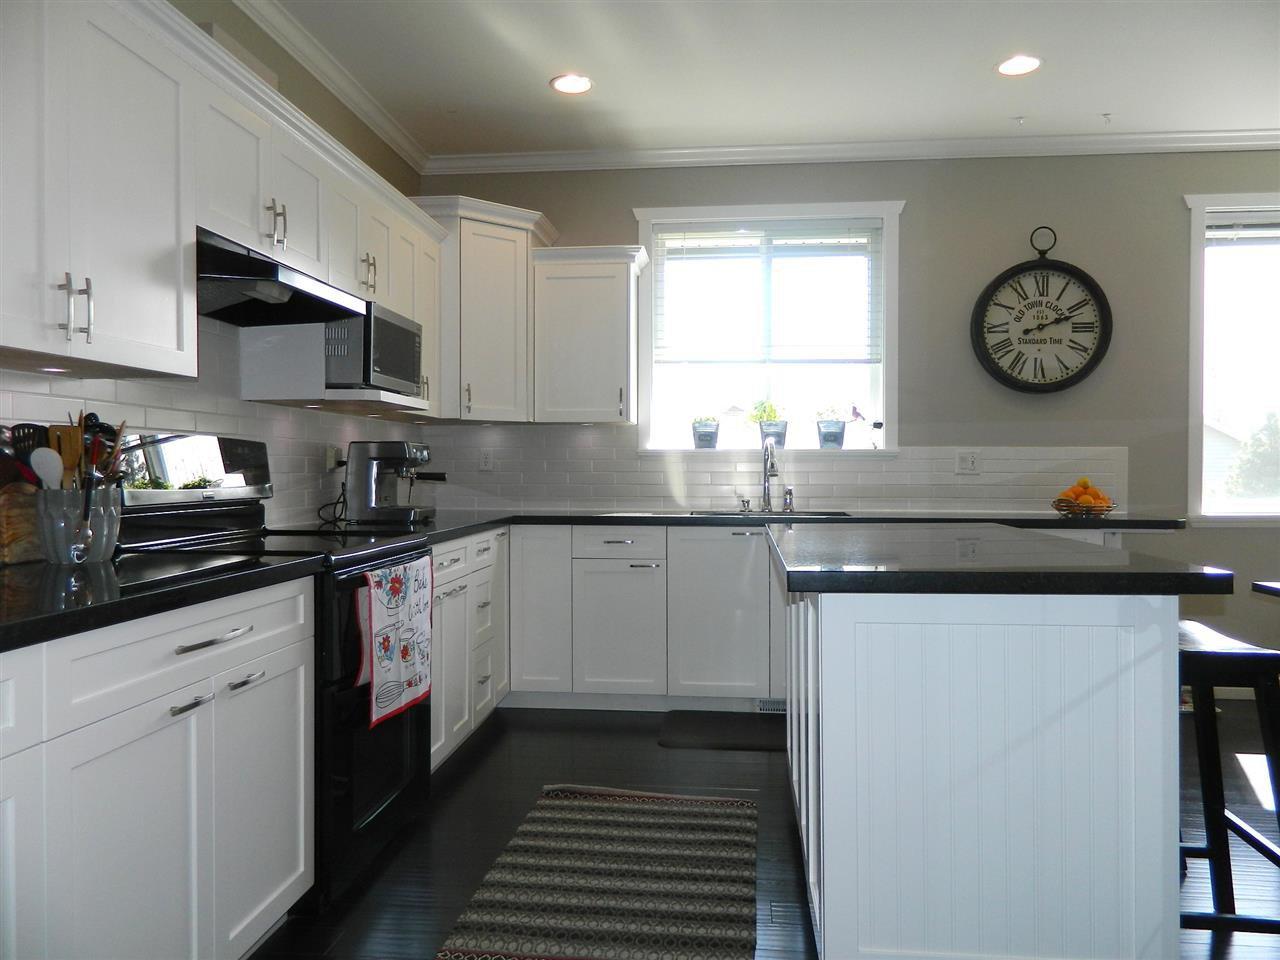 Photo 7: Photos: 24332 104 AVENUE in Maple Ridge: Albion House for sale : MLS®# R2051414